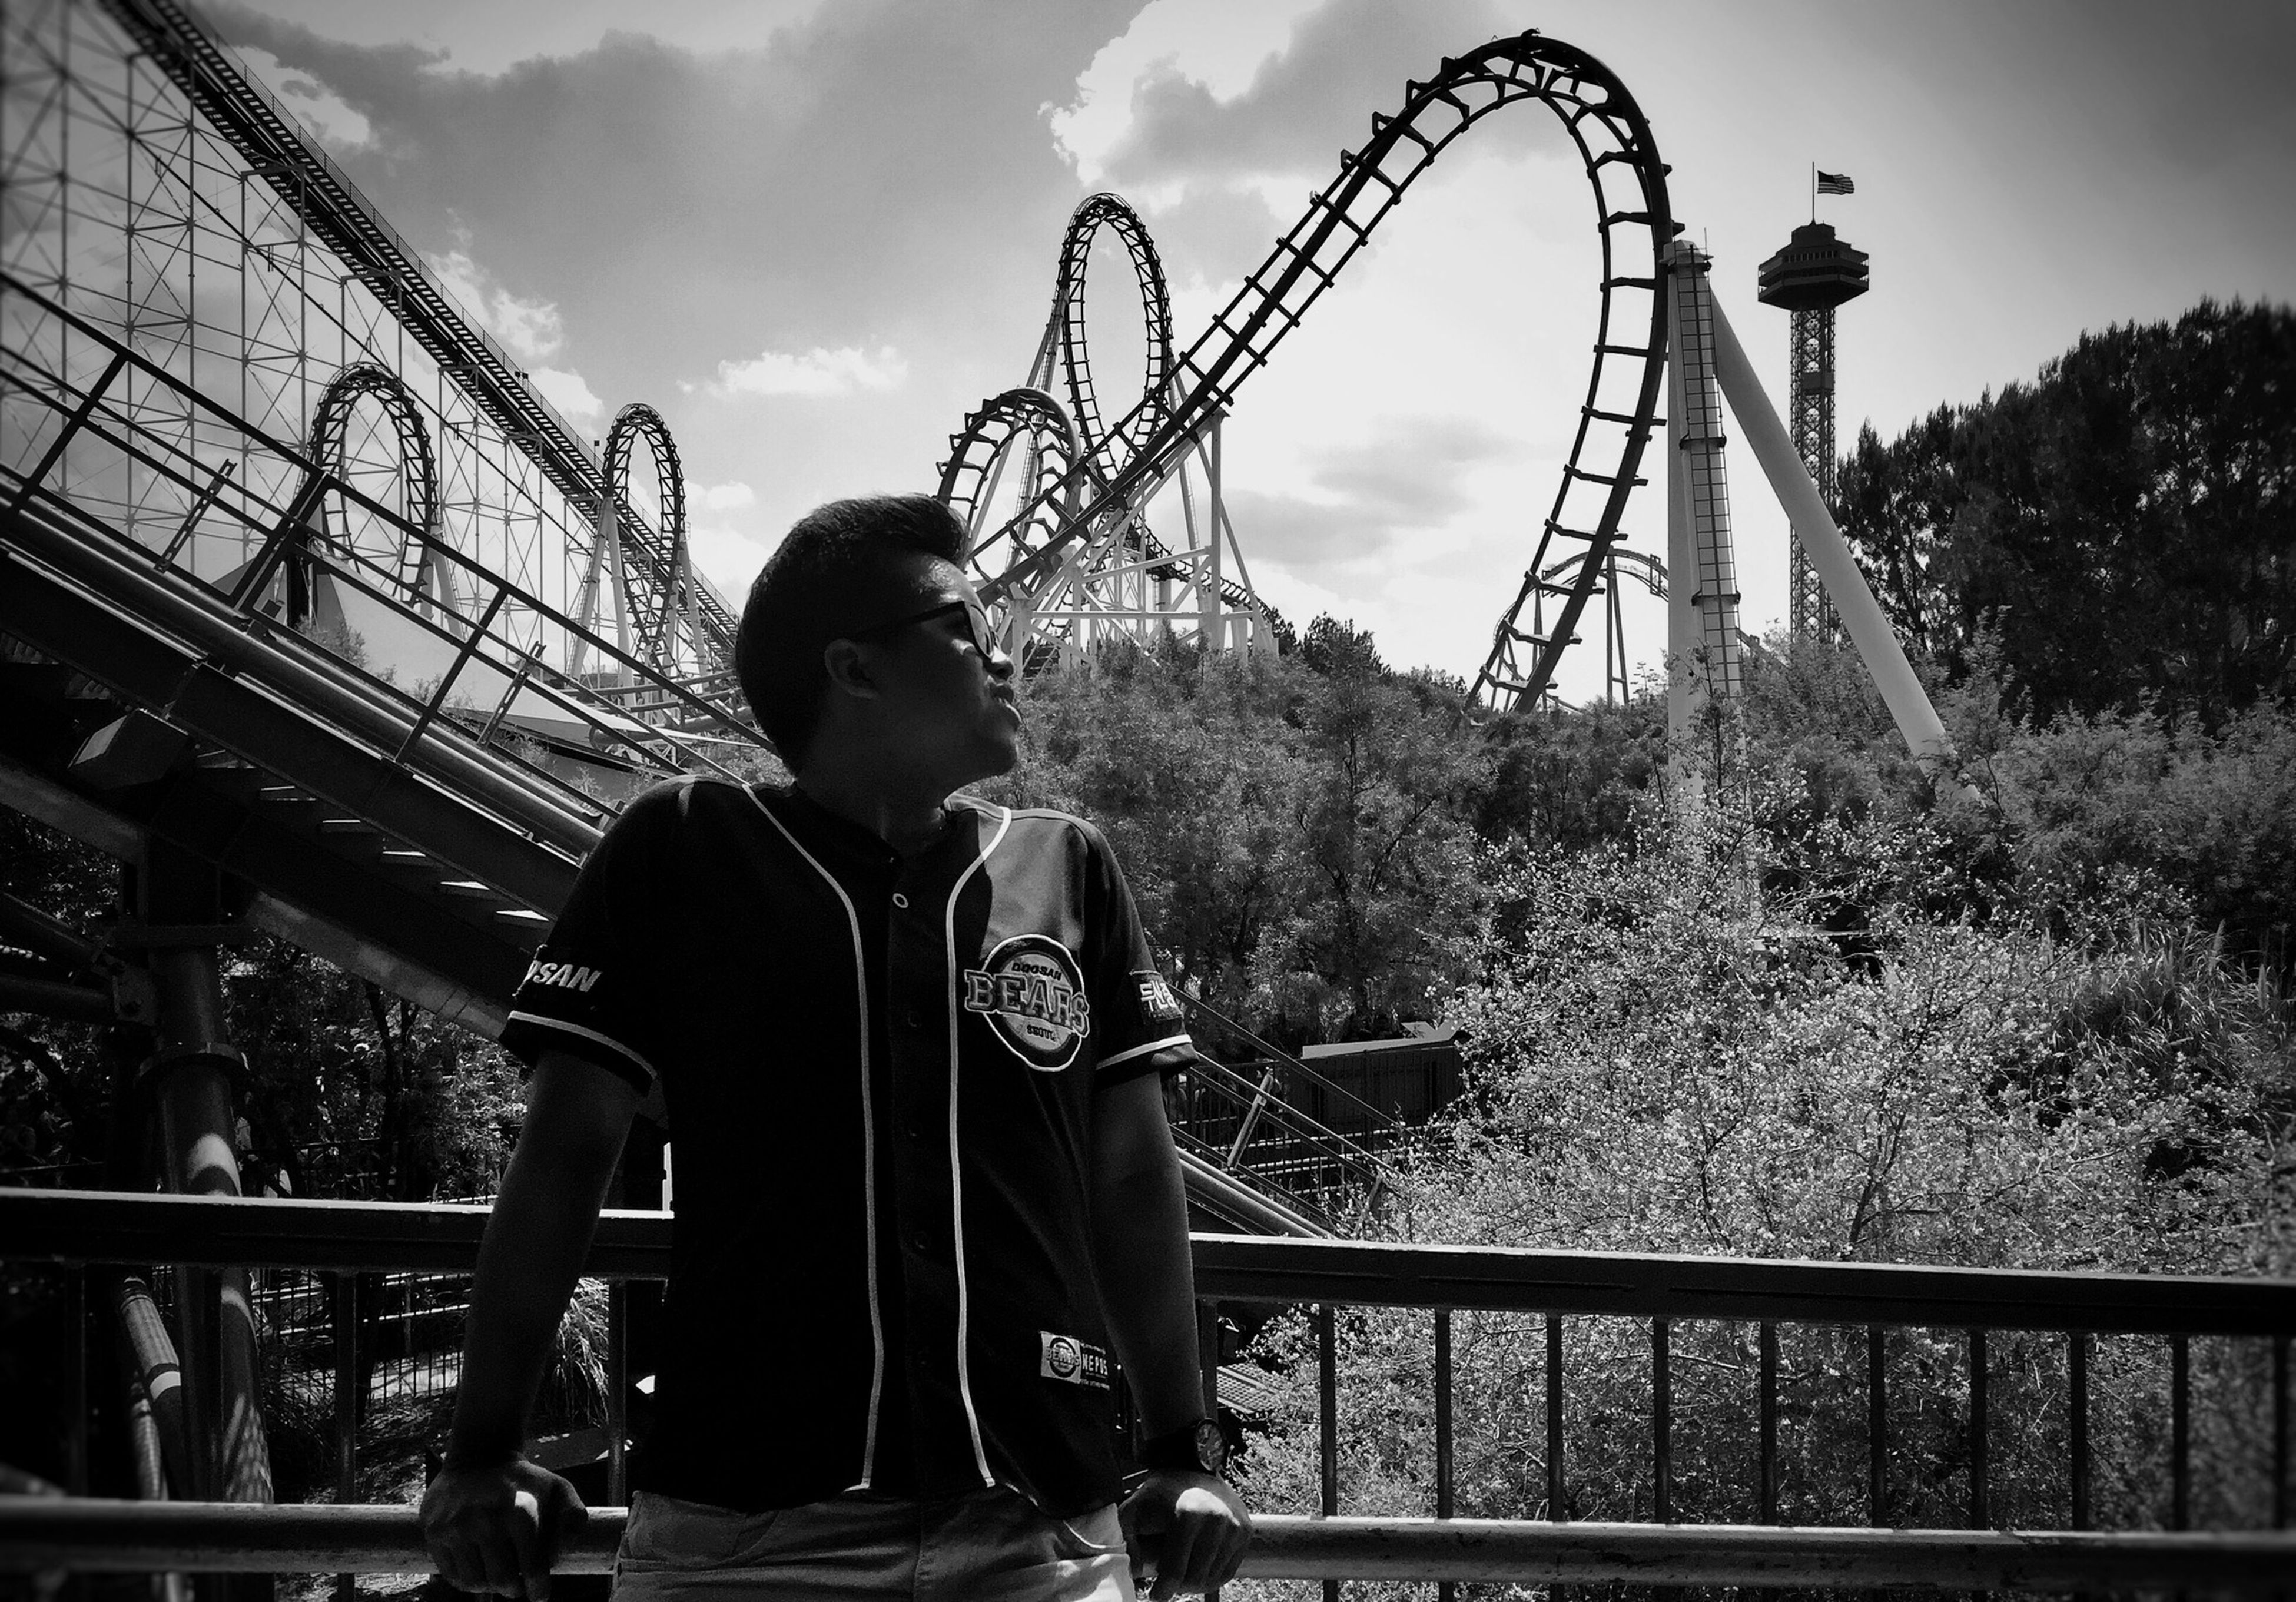 leisure activity, sky, amusement park, arts culture and entertainment, low angle view, lifestyles, amusement park ride, ferris wheel, cloud - sky, childhood, metal, tree, standing, casual clothing, rear view, built structure, men, holding